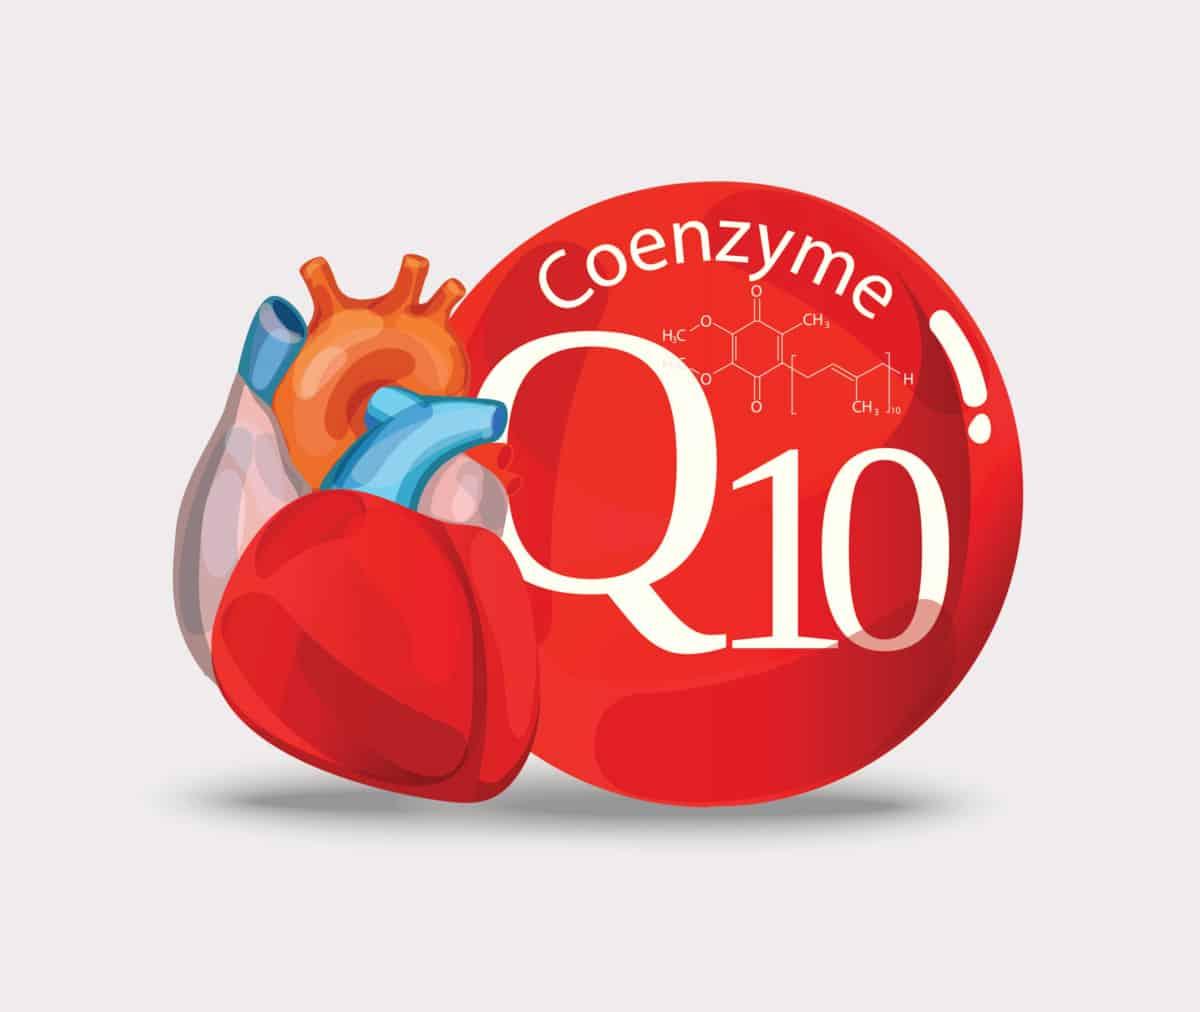 coenzyme q10 lowers blood pressure